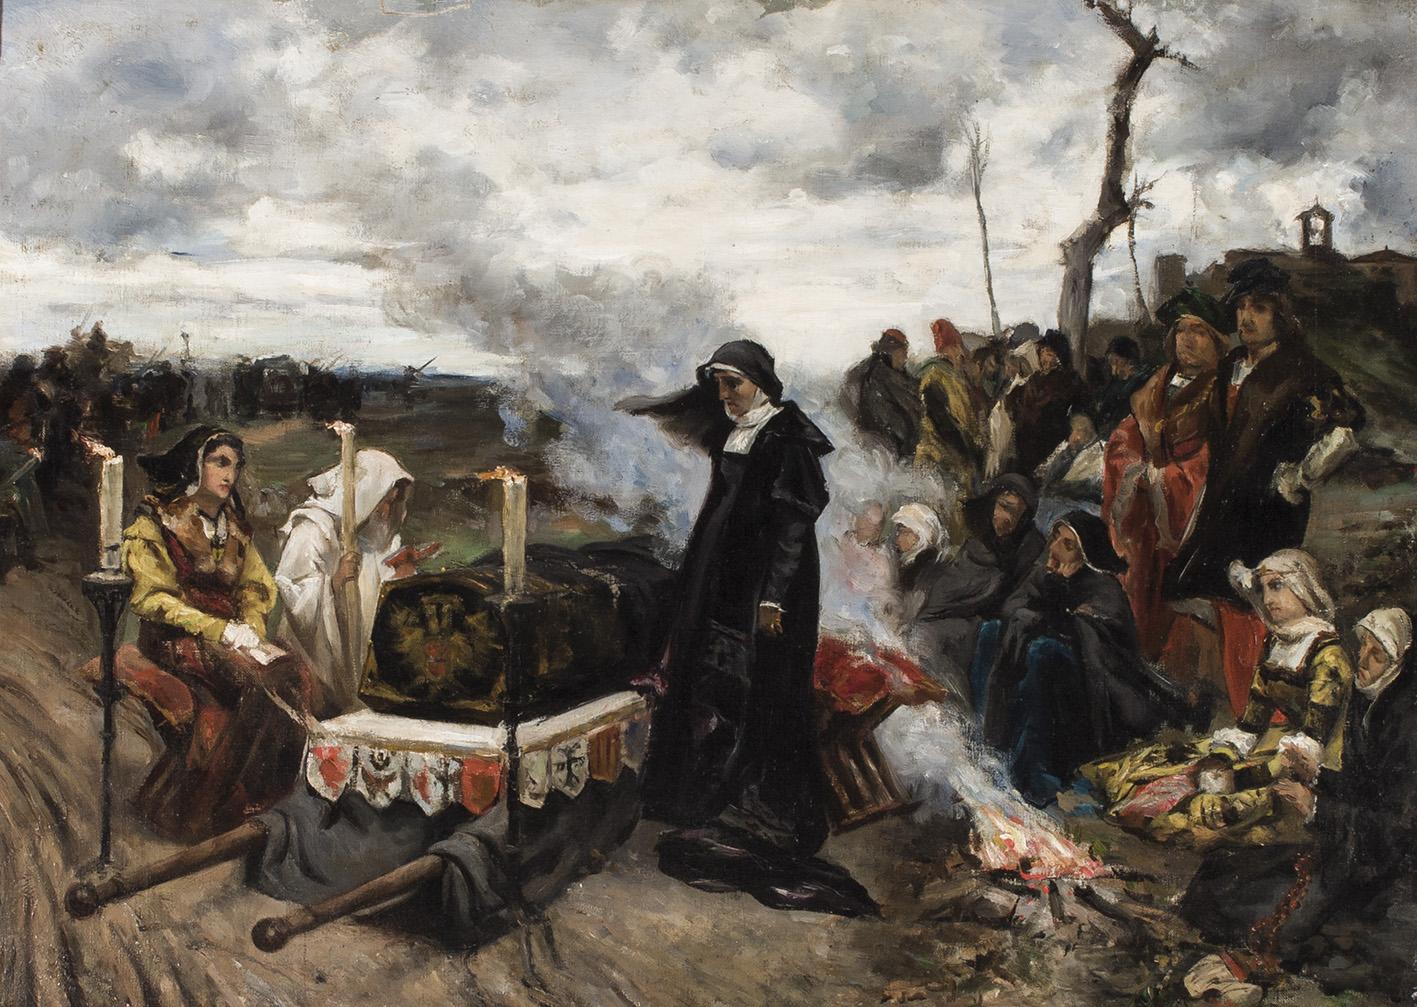 Francisco-Pradilla-Doña-Juana-la-Loca